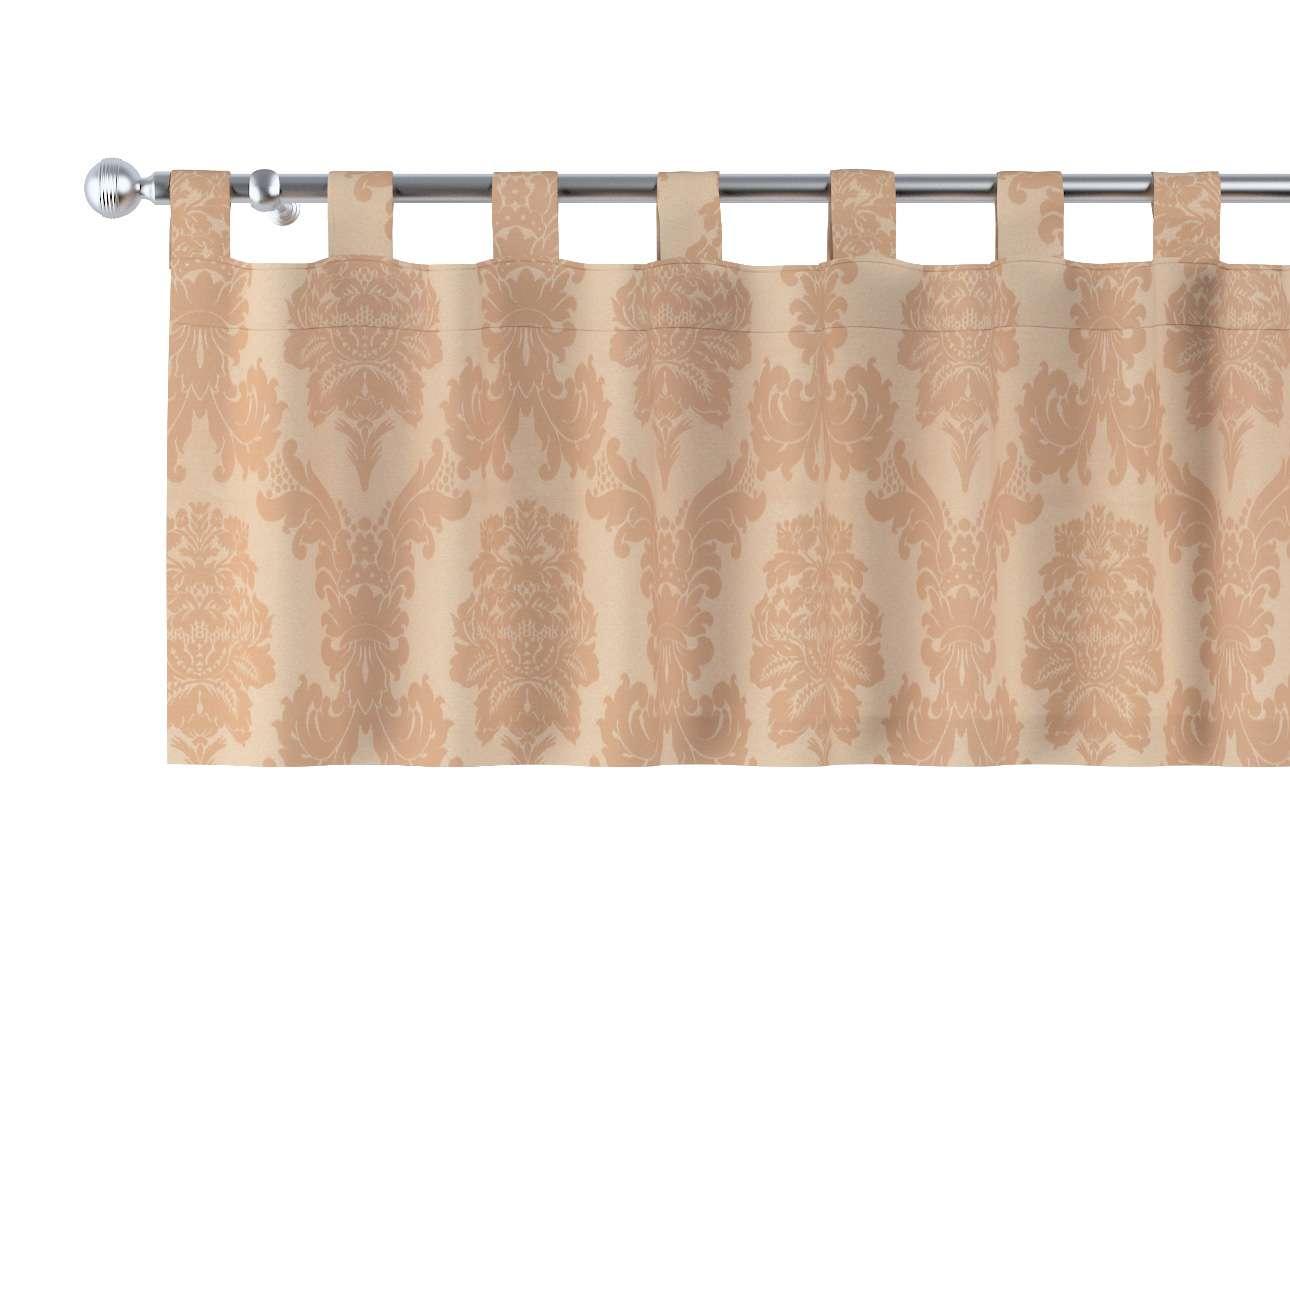 Lambrekin na szelkach 130x40cm w kolekcji Damasco, tkanina: 613-04